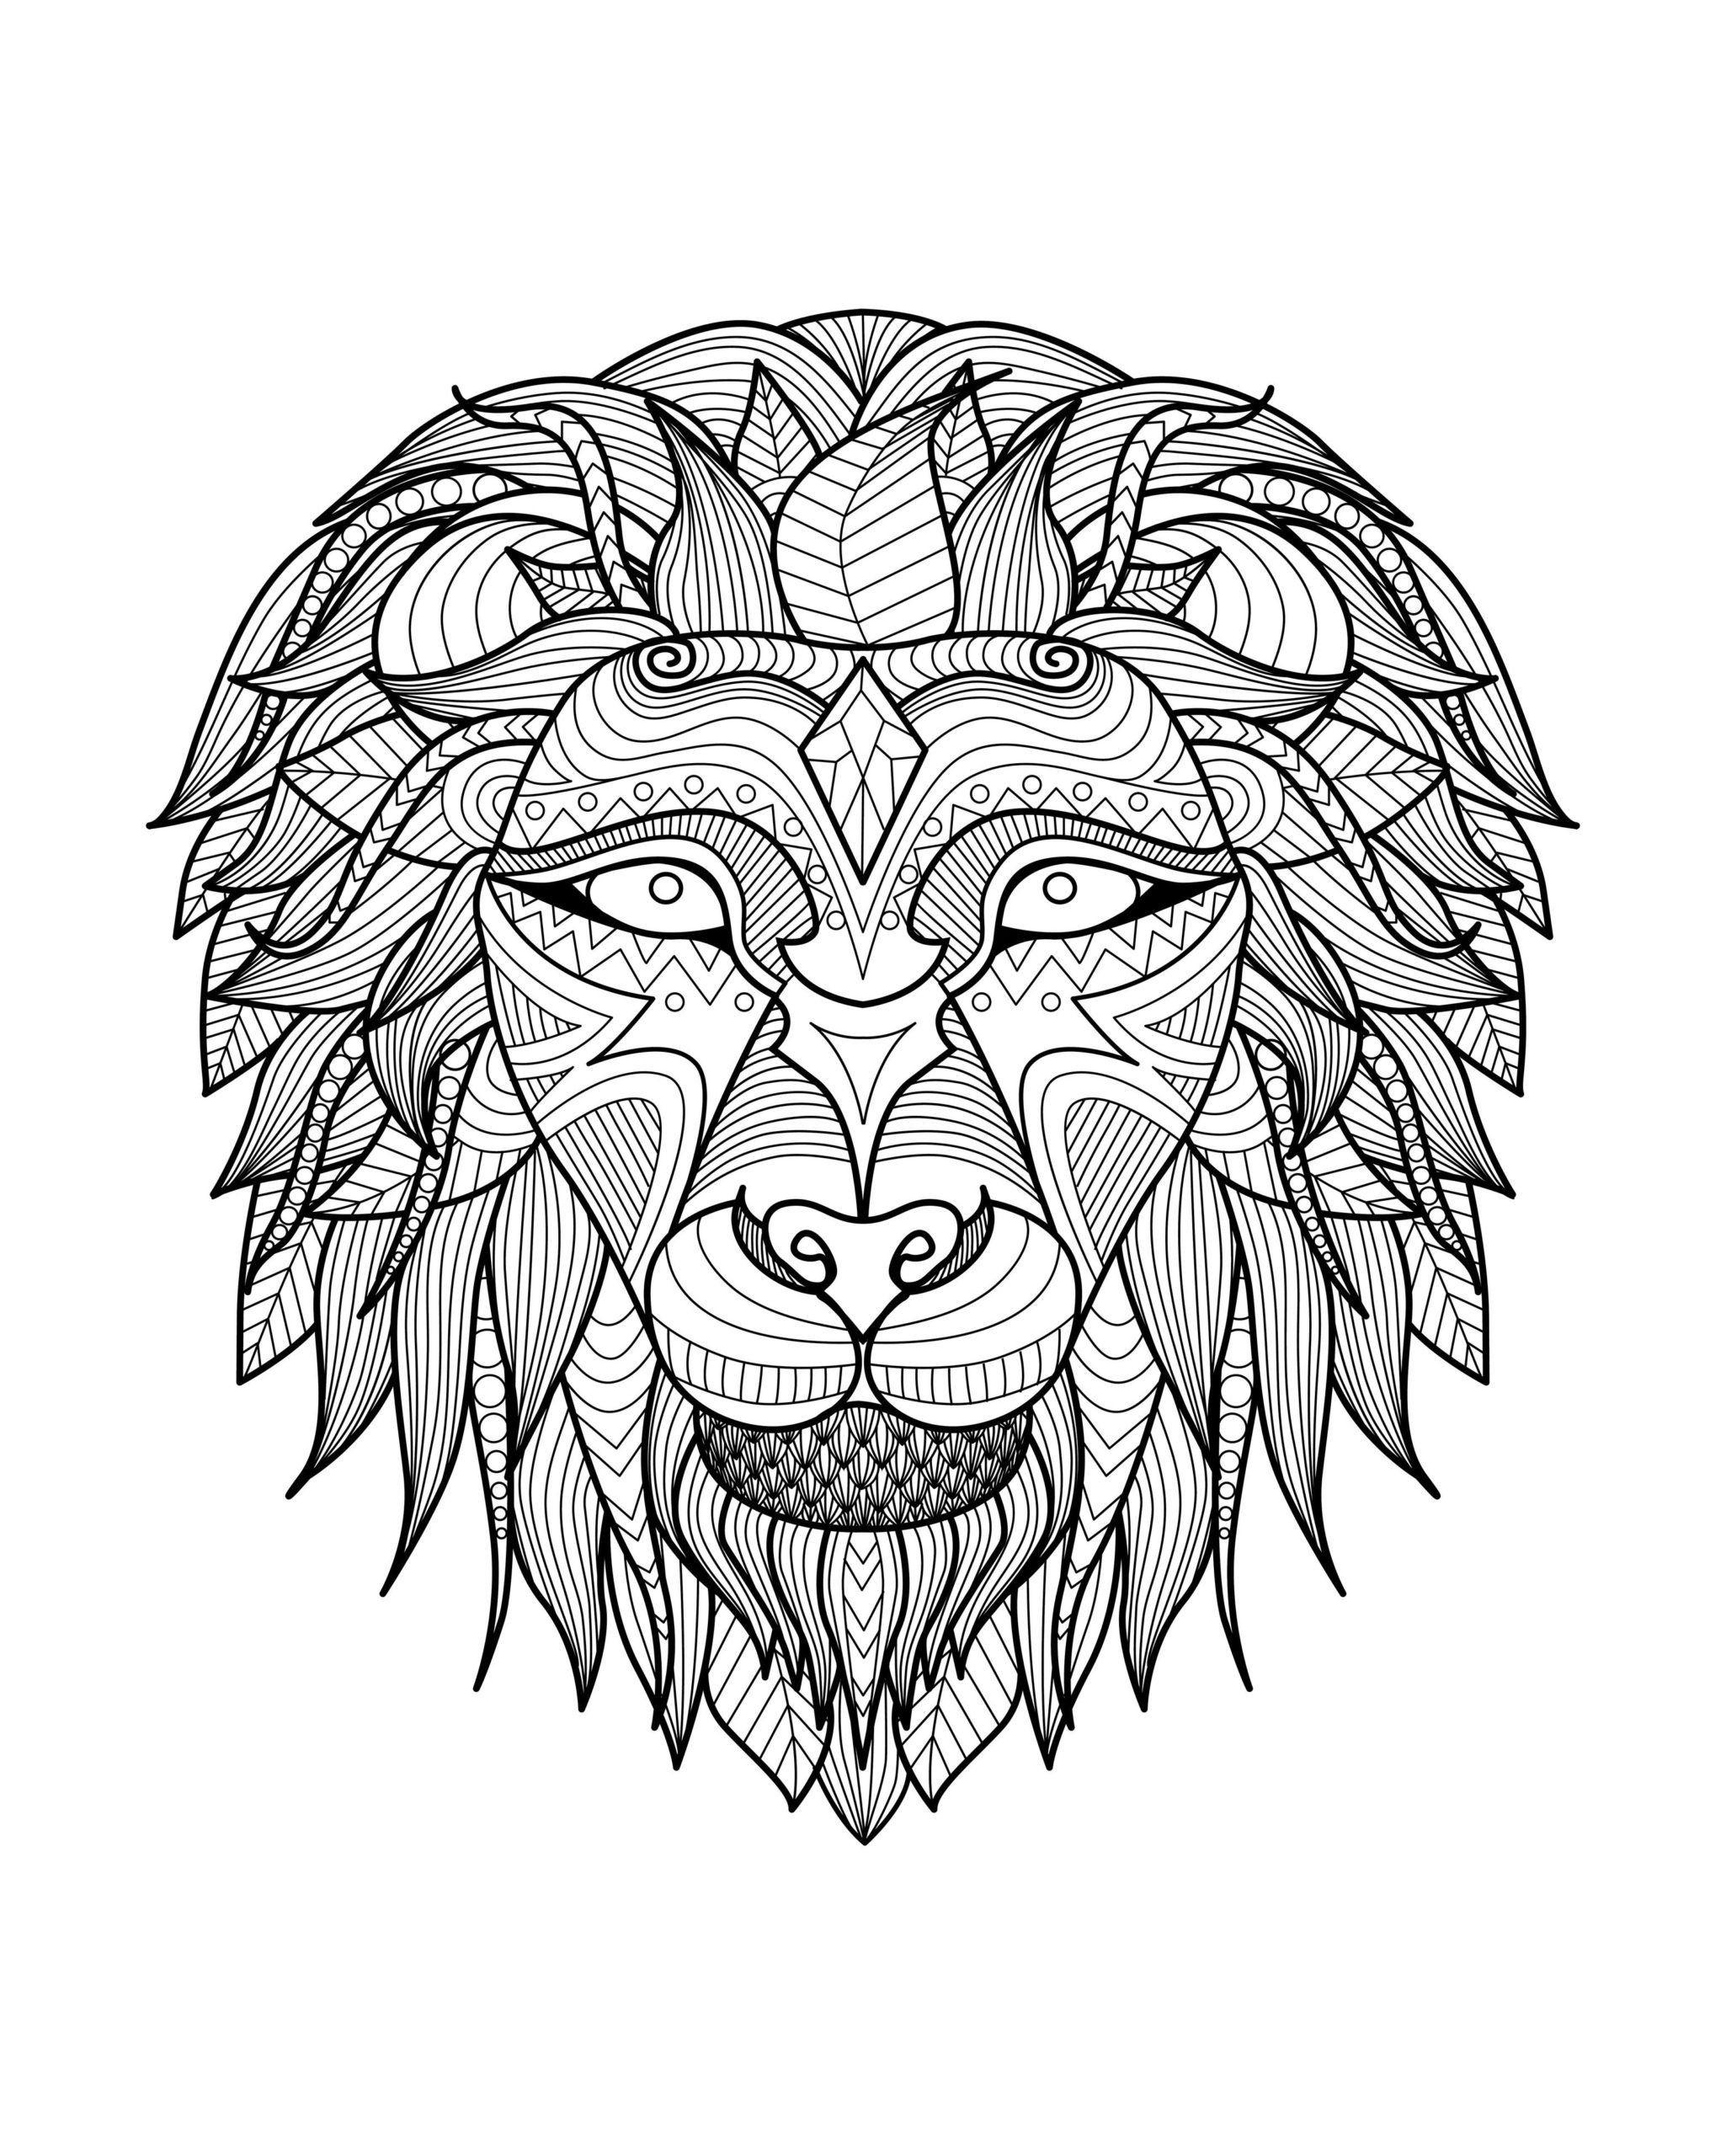 Lion Mandala Coloring Pages Coloring Pages Mandala Lion Coloring For Adults Free Animal Coloring Pages Lion Coloring Pages Cat Coloring Page